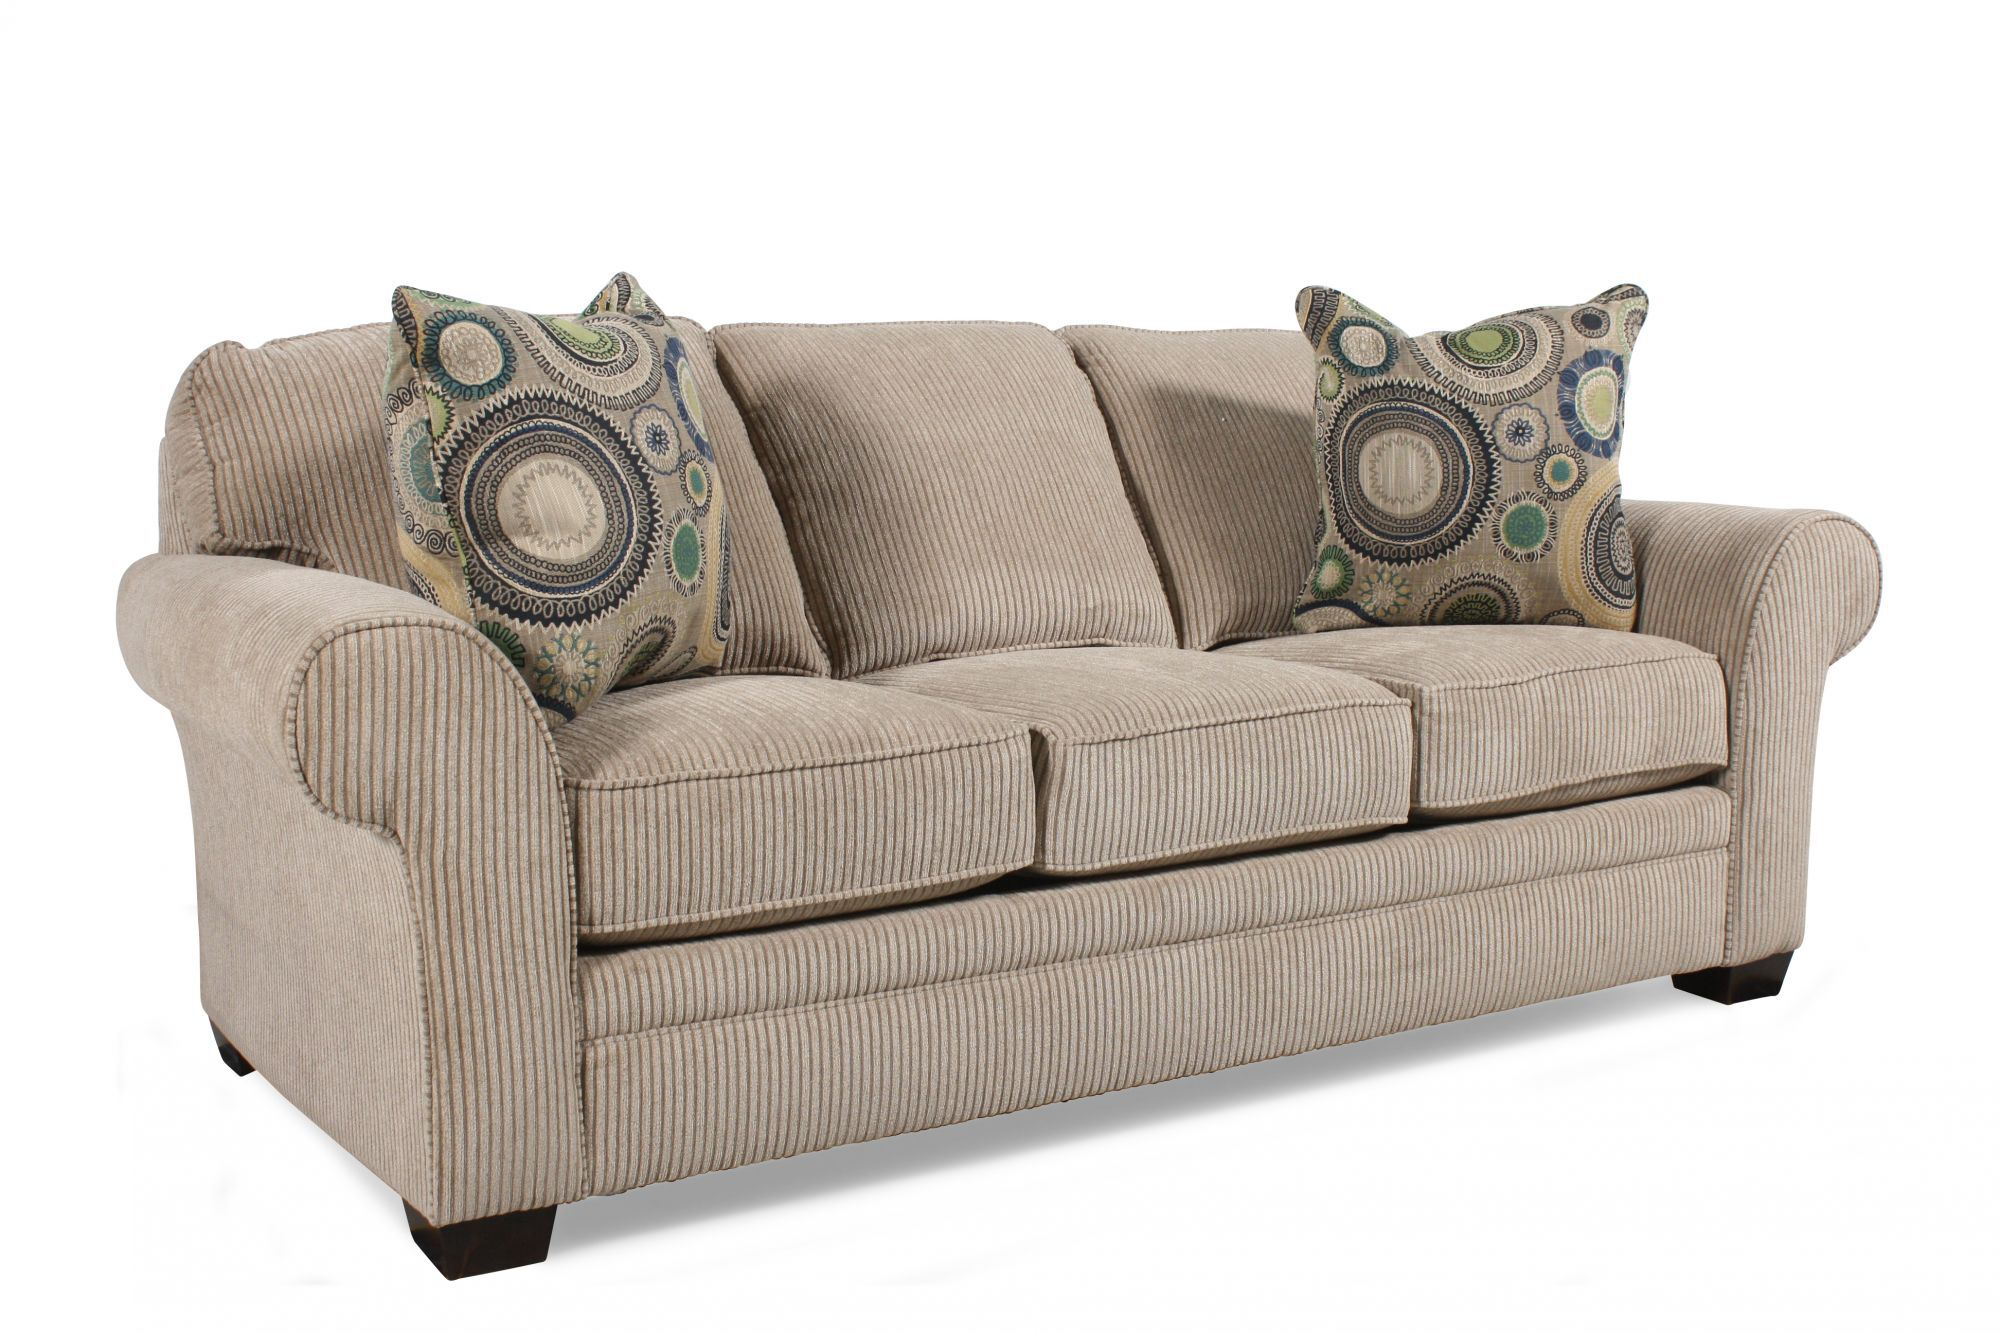 Handcrafted Rolled Arm 72 Queen Sleeper Sofa In Sandstone